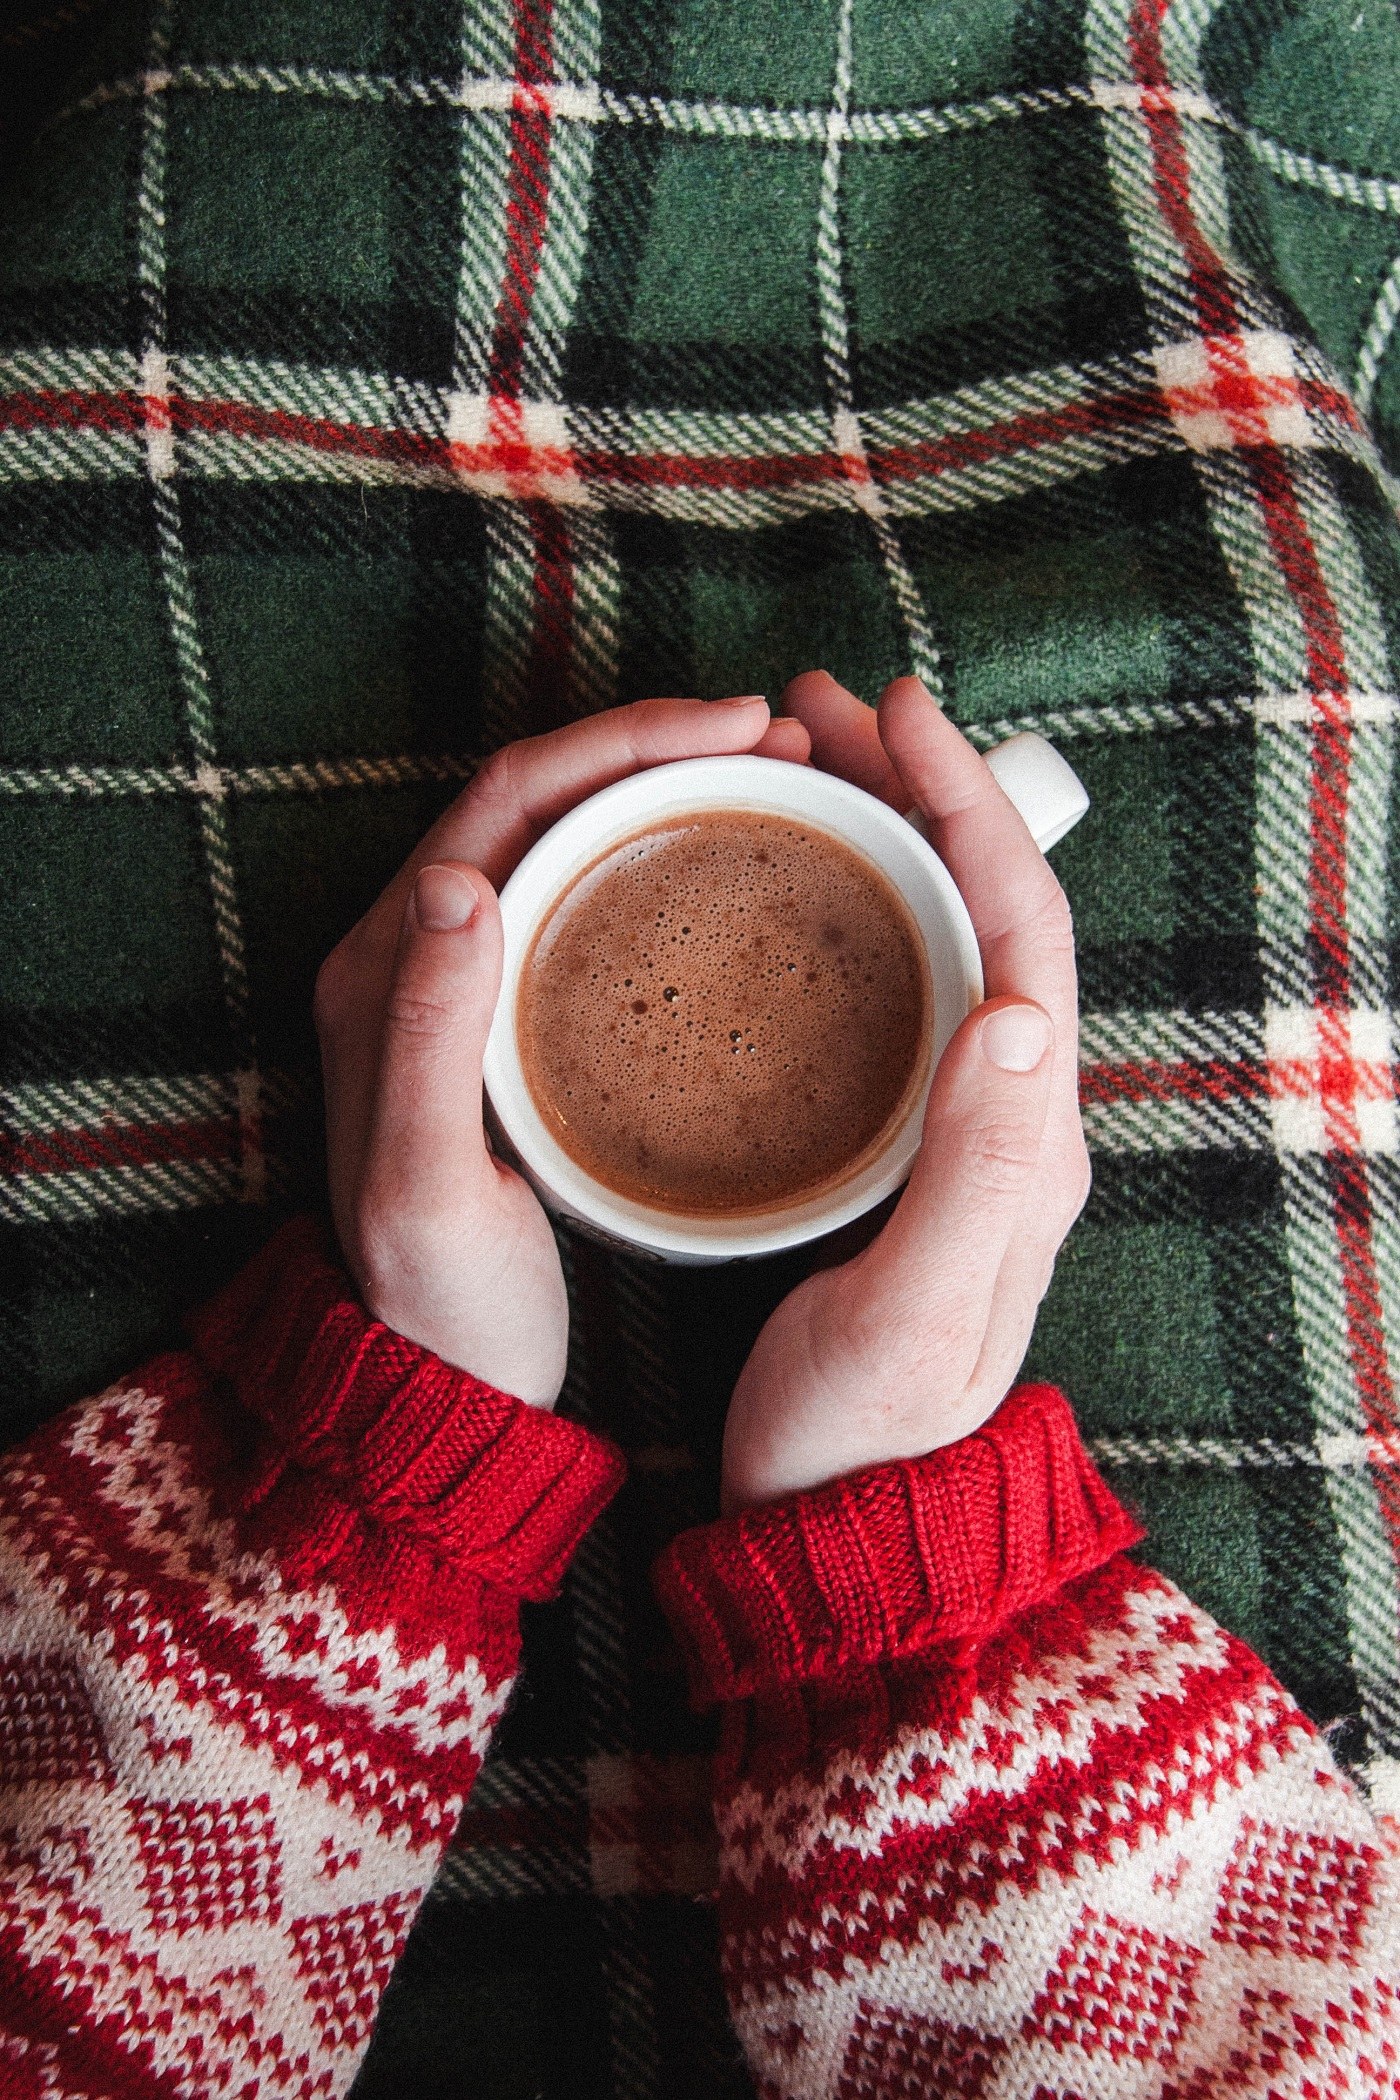 My Deliciously Creamy Hot Chocolate Recipe